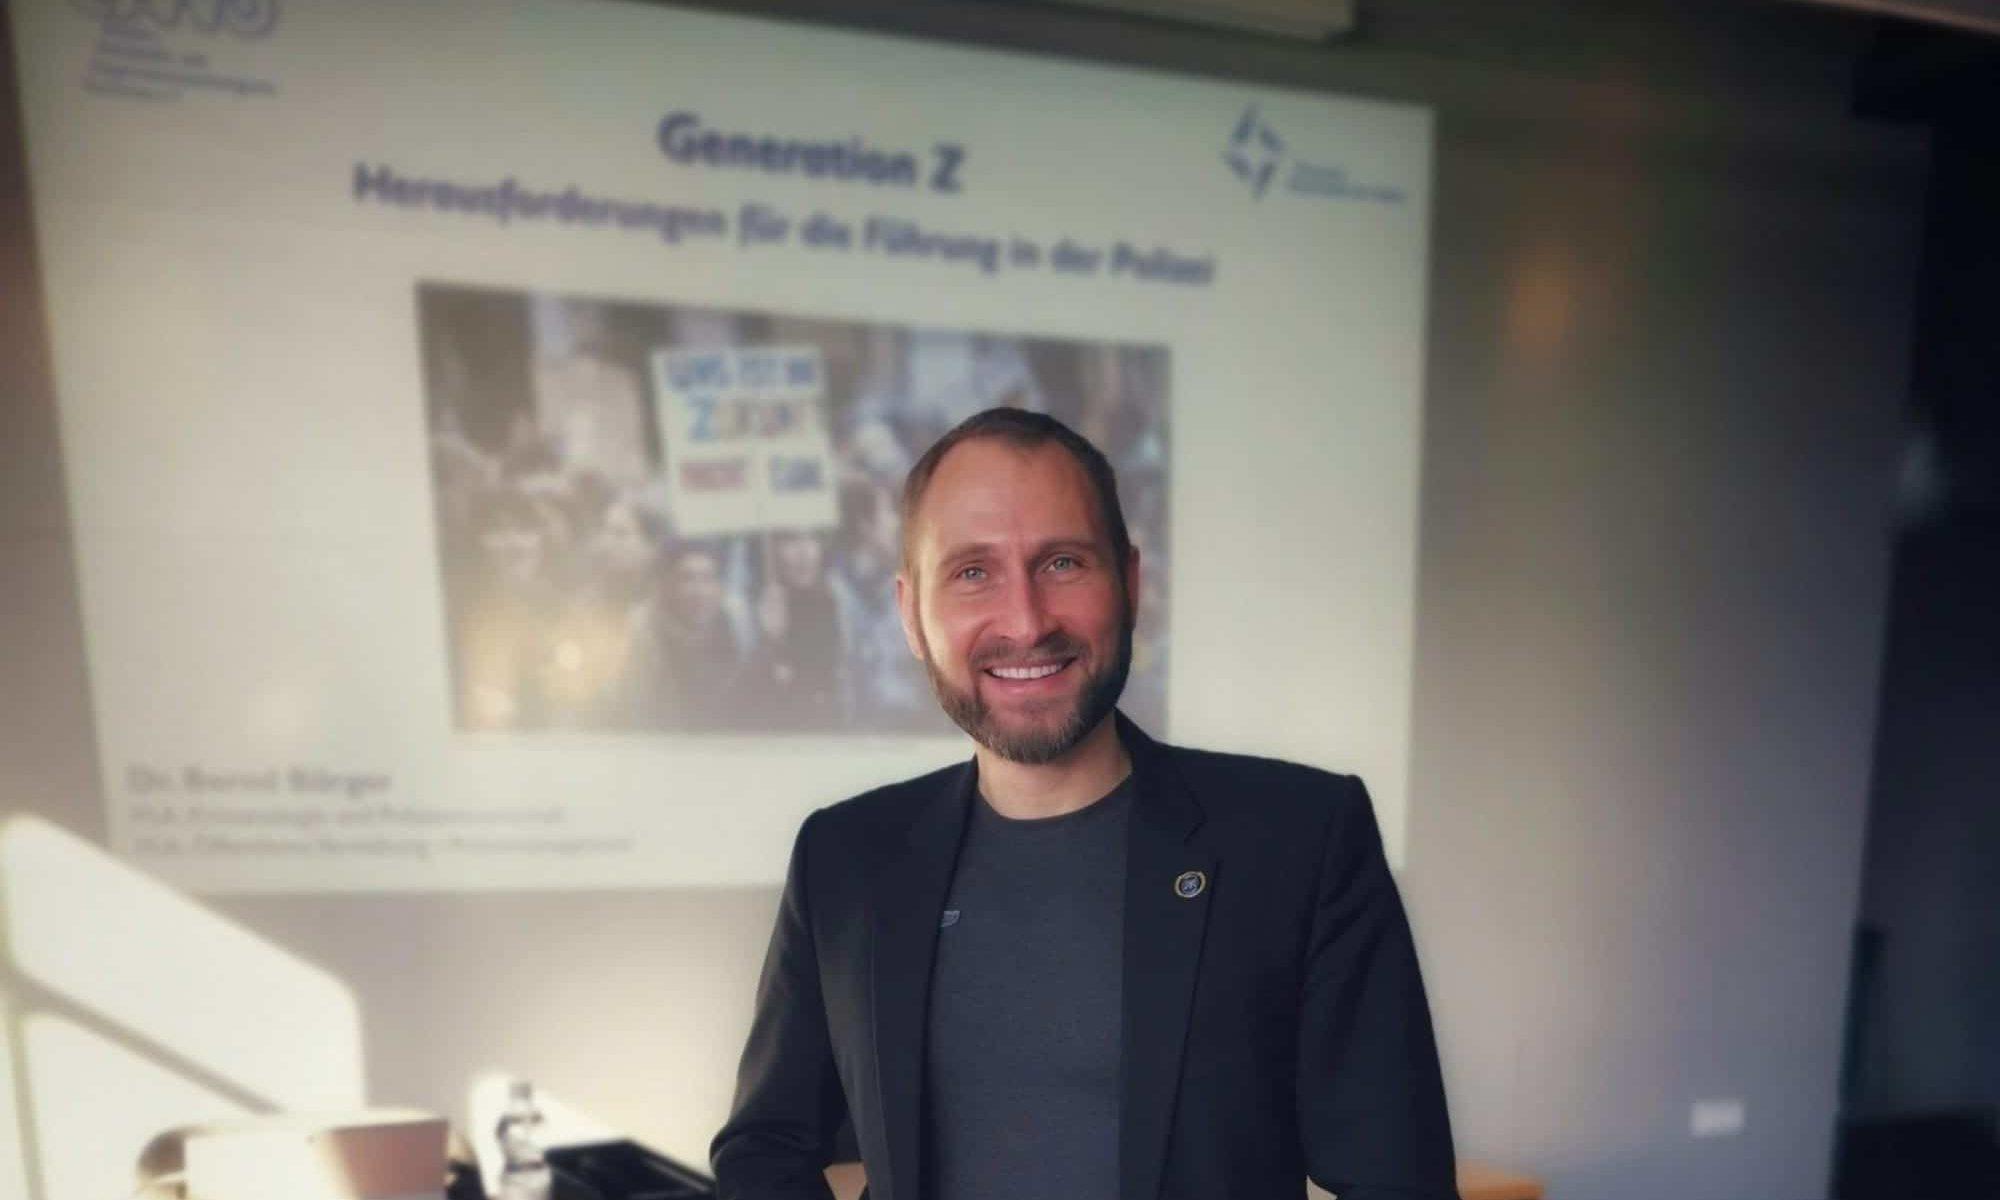 Dr. Bernd Bürger